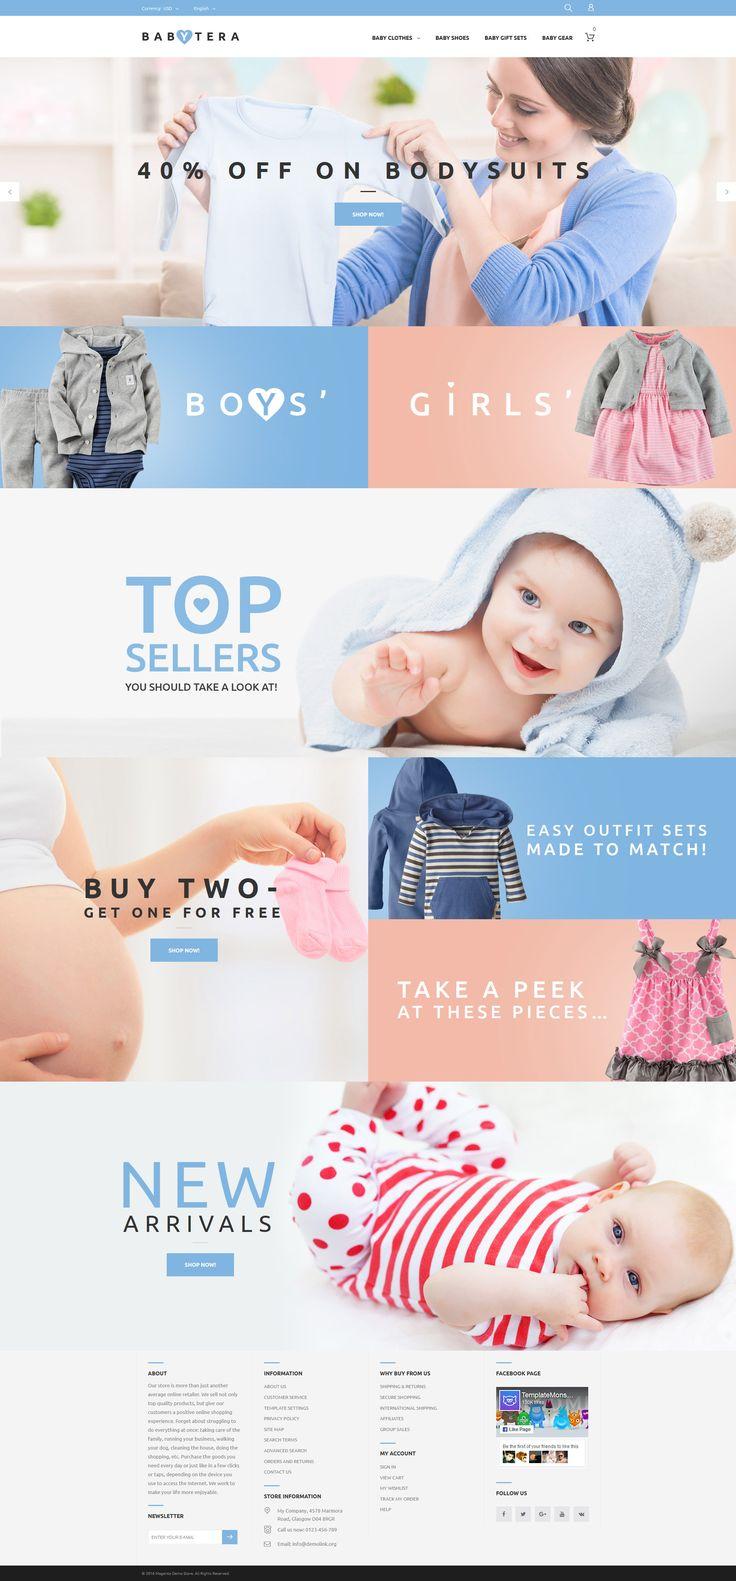 Babytera - Magento Theme - http://www.templatemonster.com/magento-themes/baby-store-responsive-magento-theme-61191.html